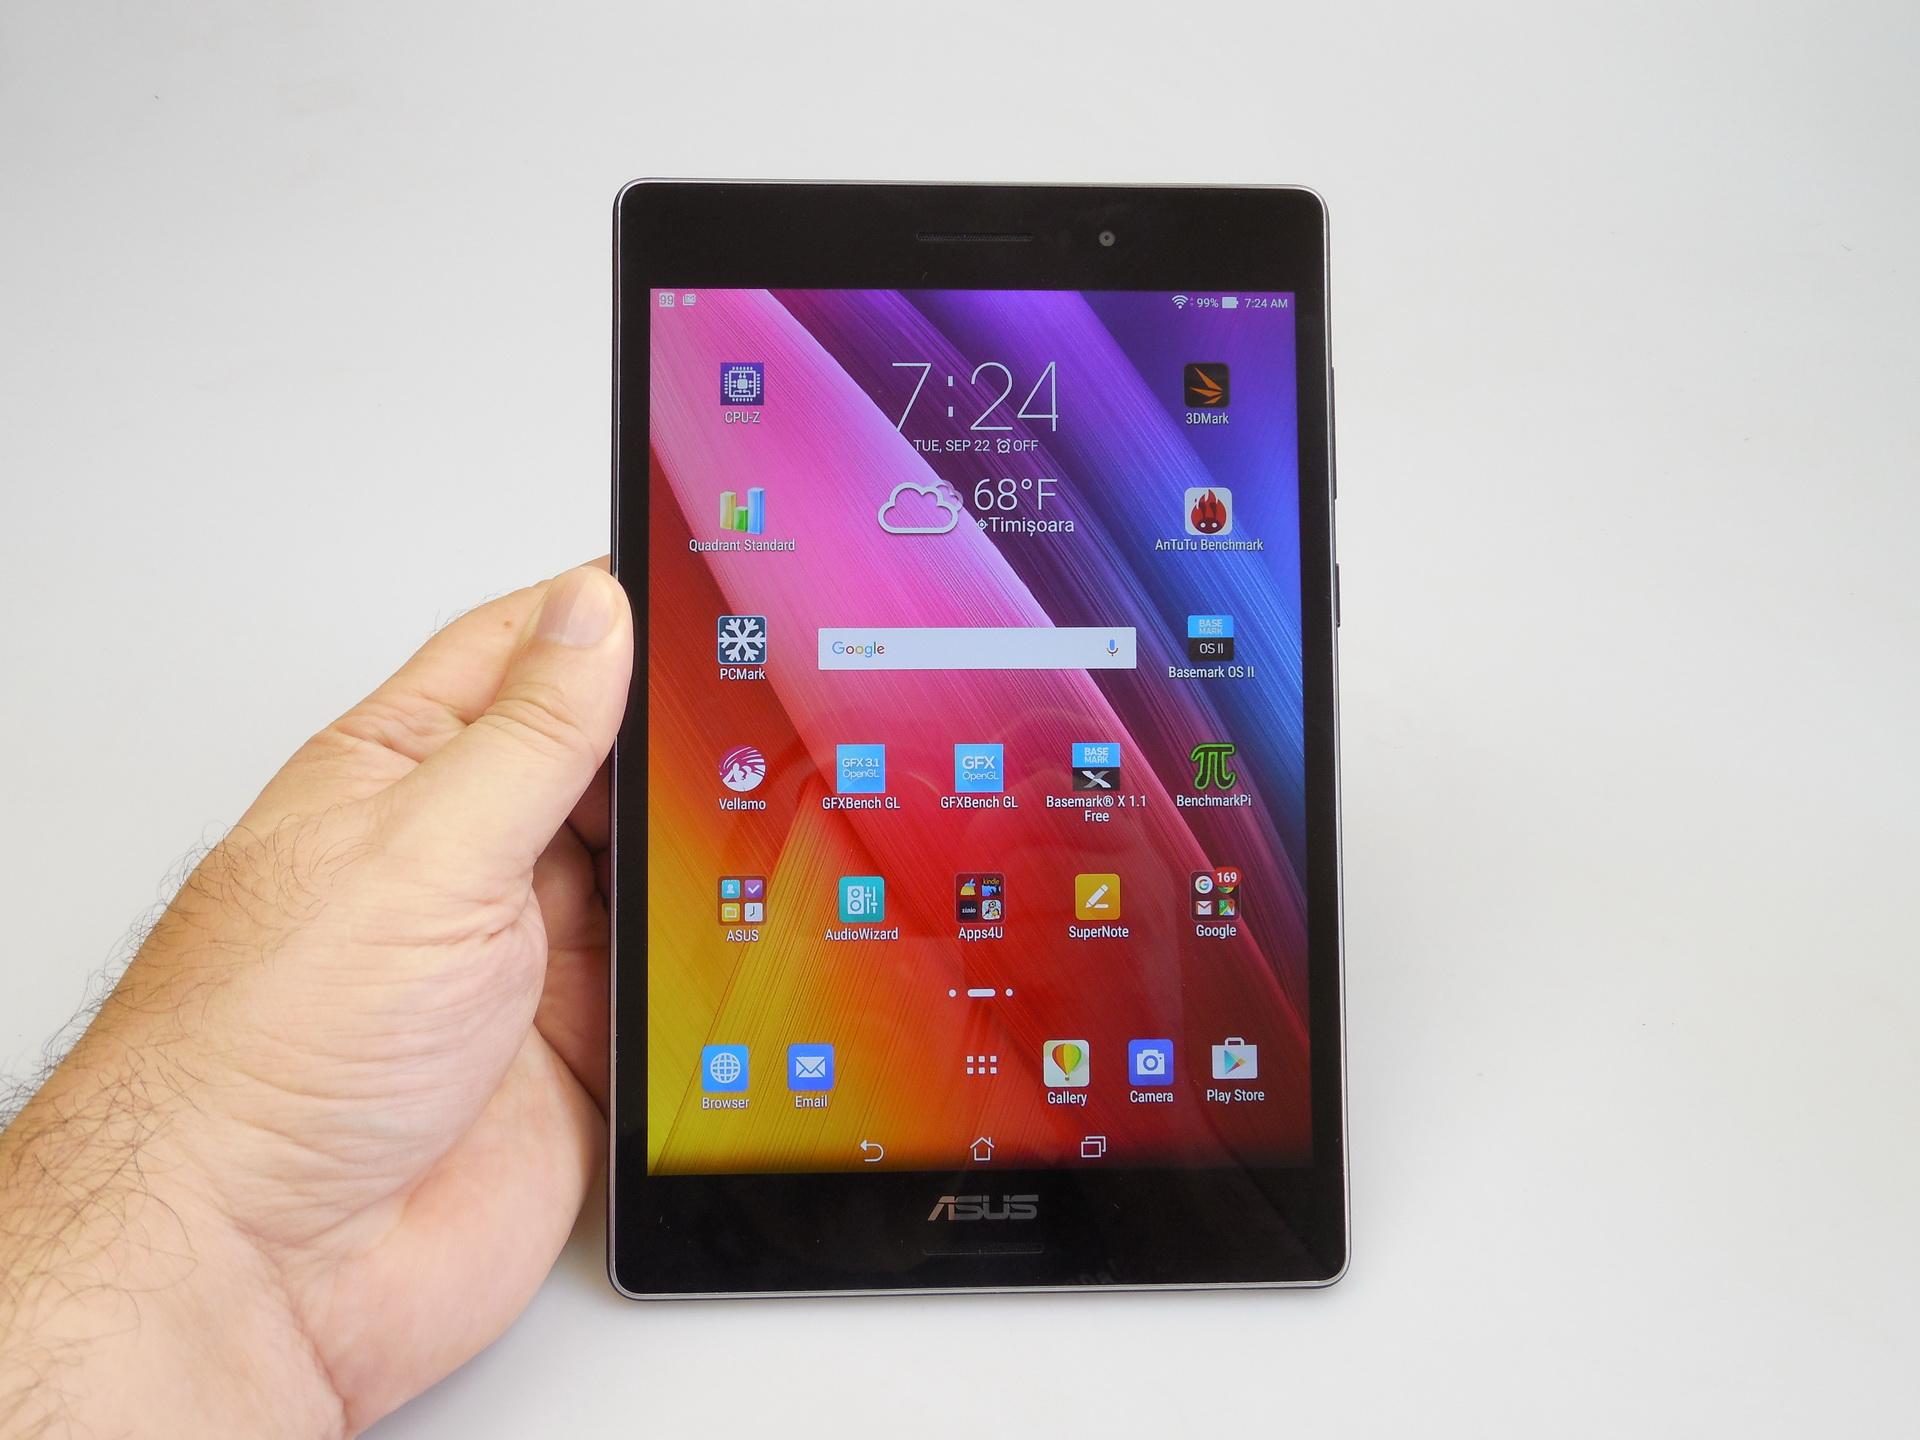 ASUS ZenPad S 8 0 Z580CA Review: Elegant and Slim Tablet